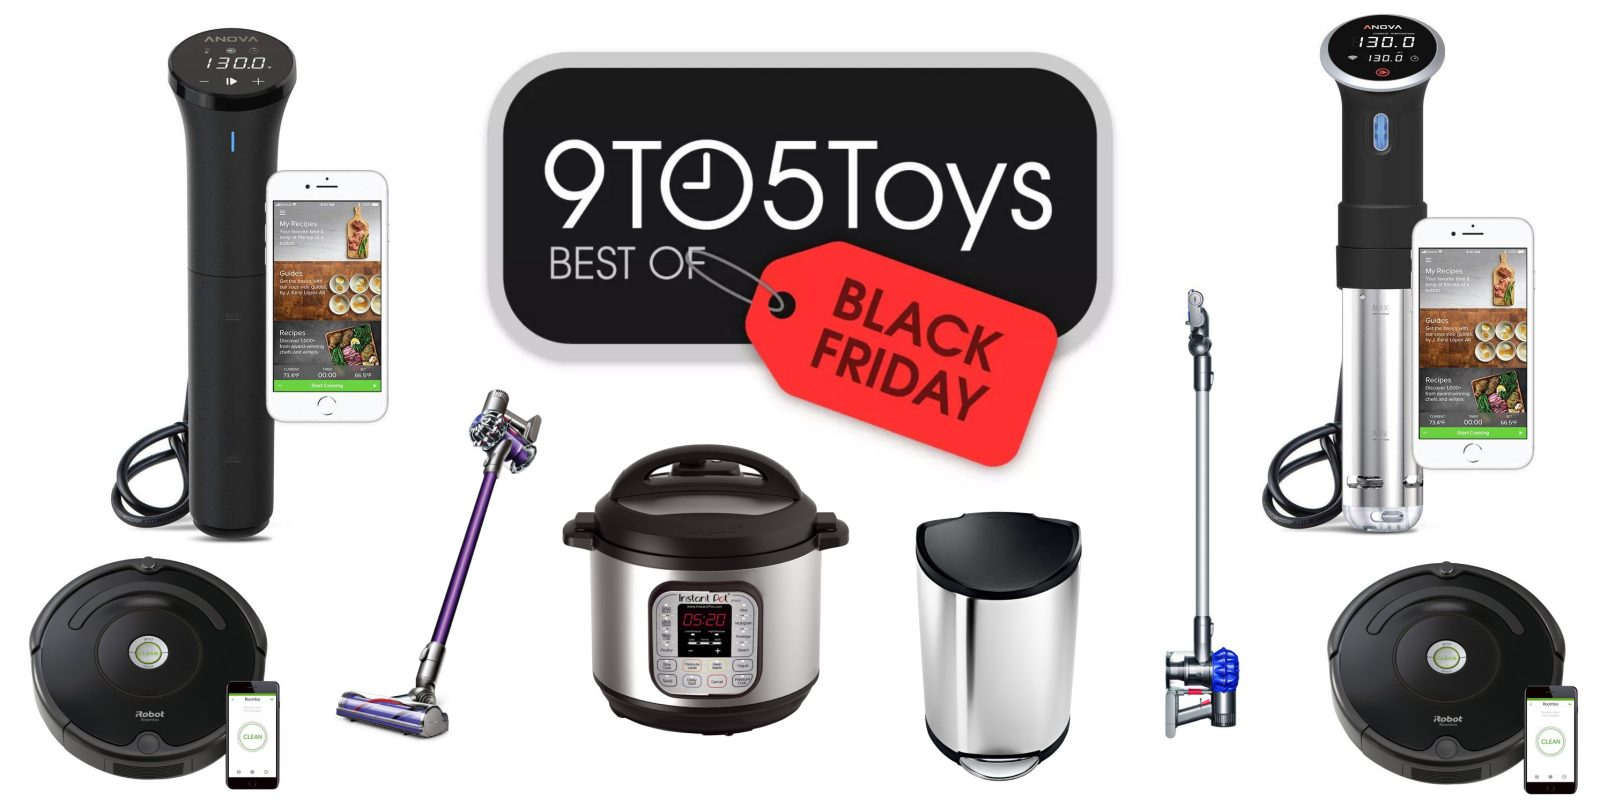 Best Of Black Friday 2018 Home Goods Anova Instant Pot Dyson